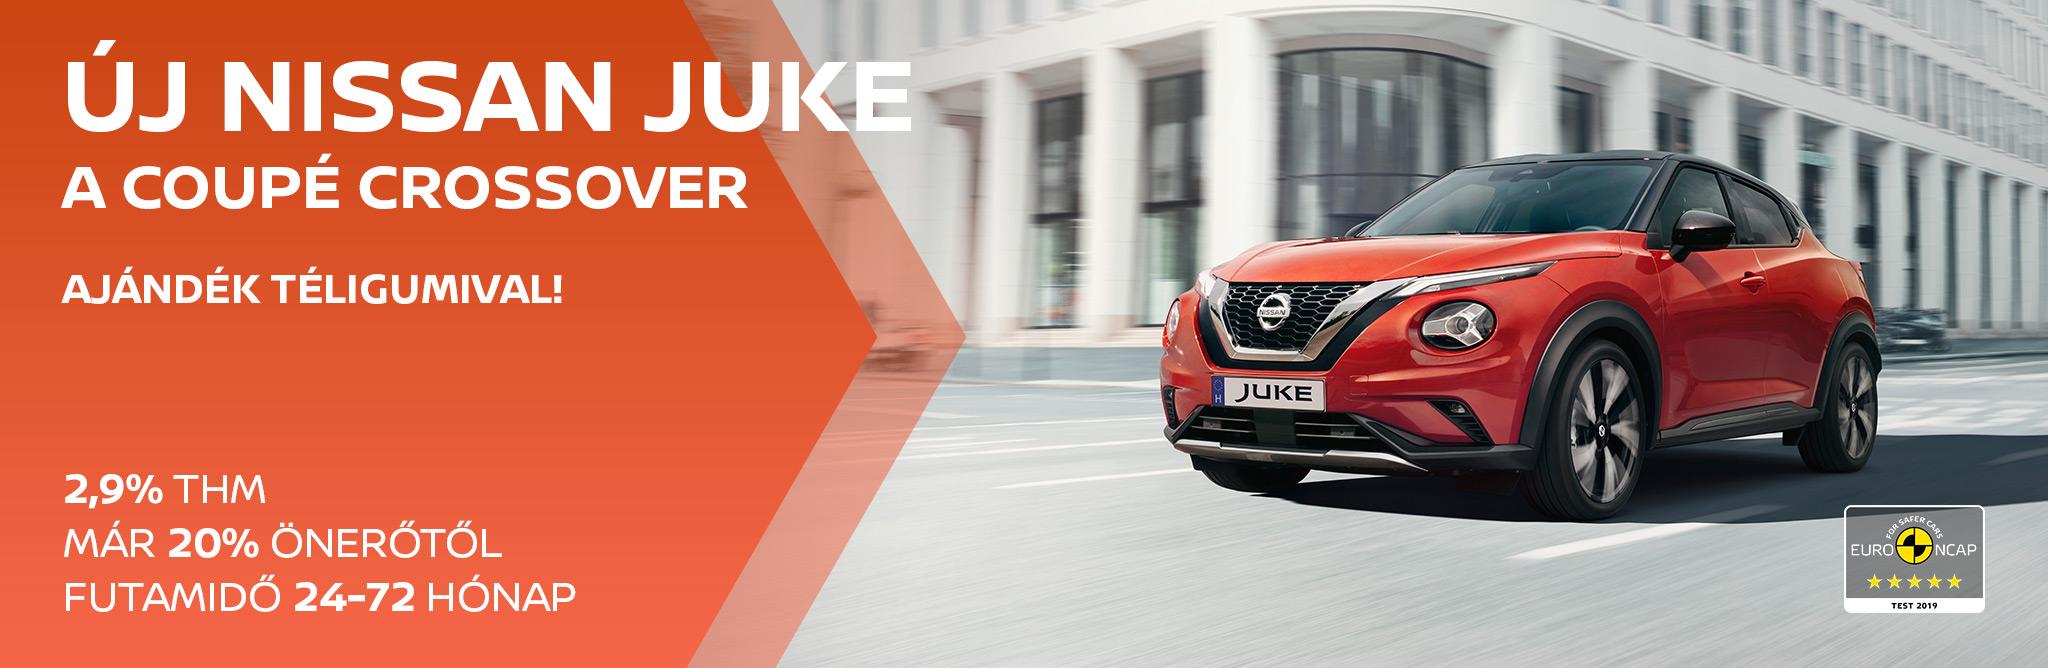 Új Nissan Juke 2,9% THM